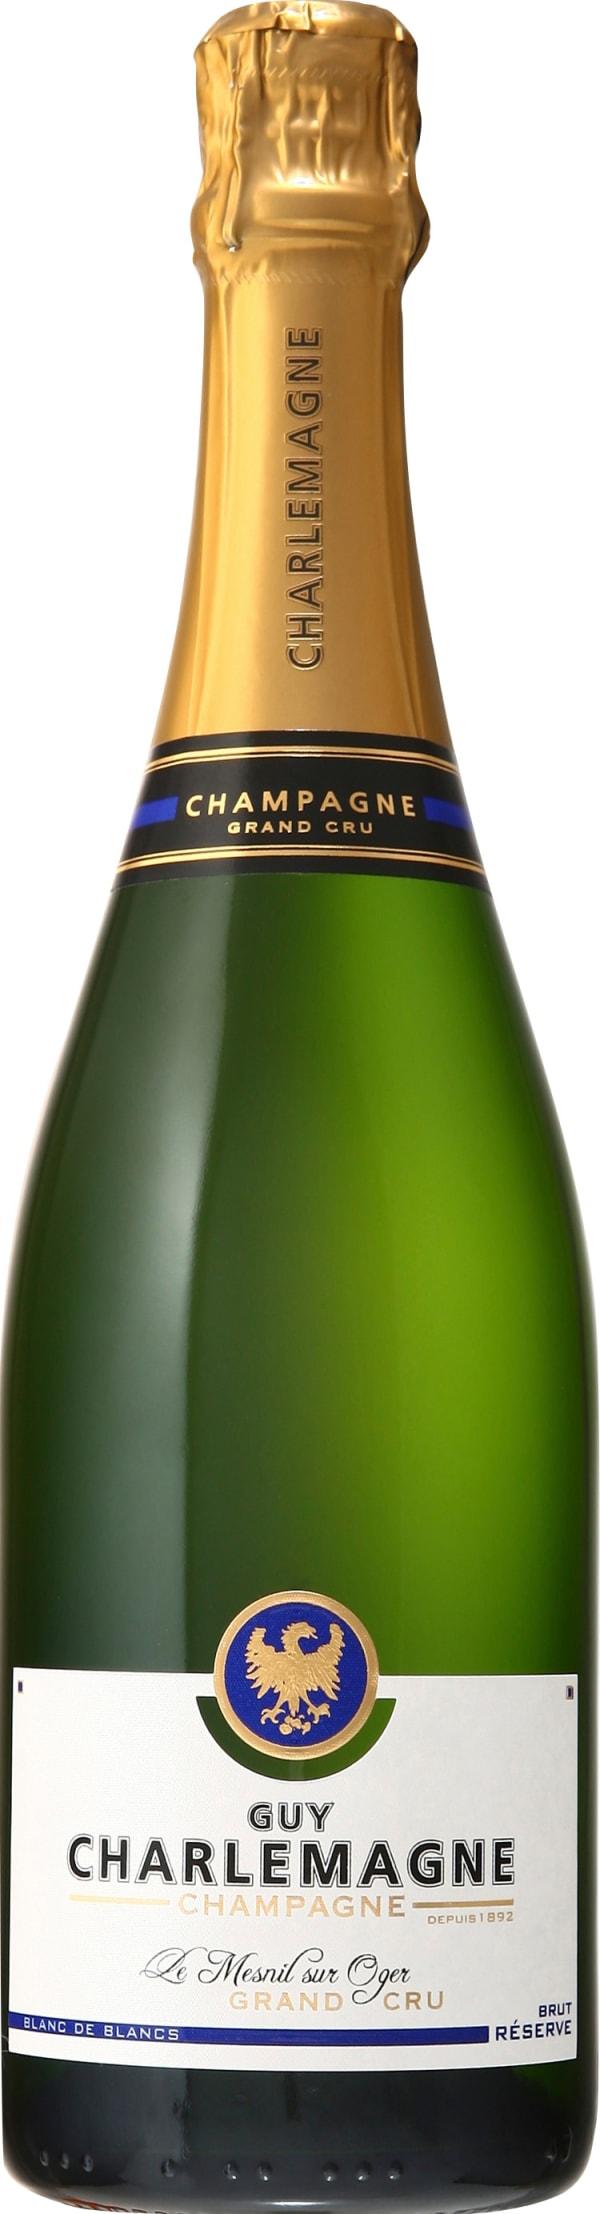 Guy Charlemagne Grand Cru Blanc De Blancs Champagne Brut